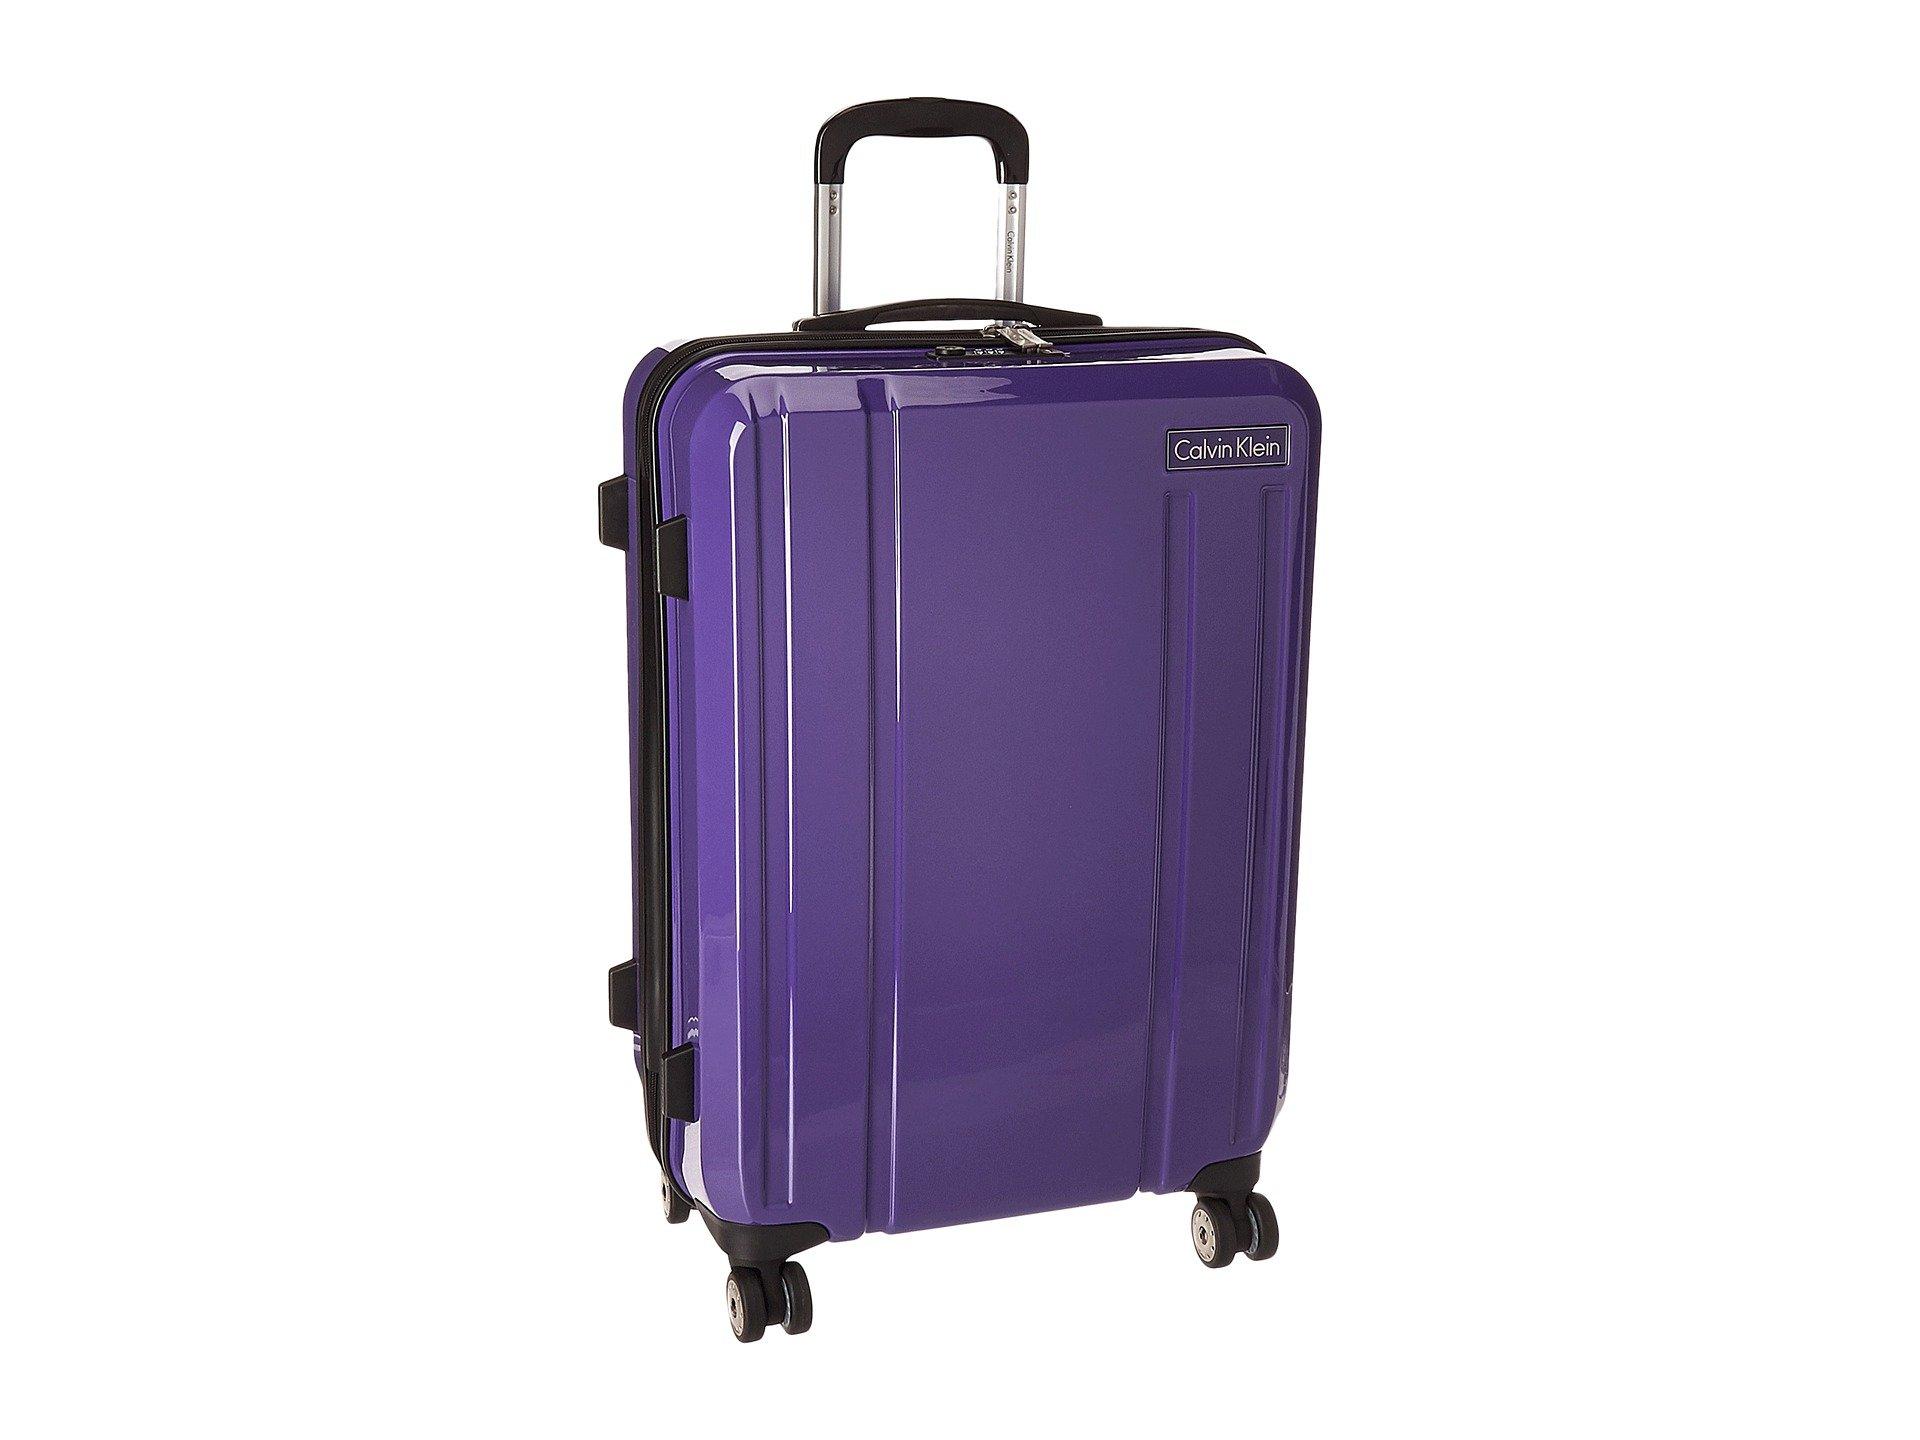 "Beacon 24"" Upright Suitcase"